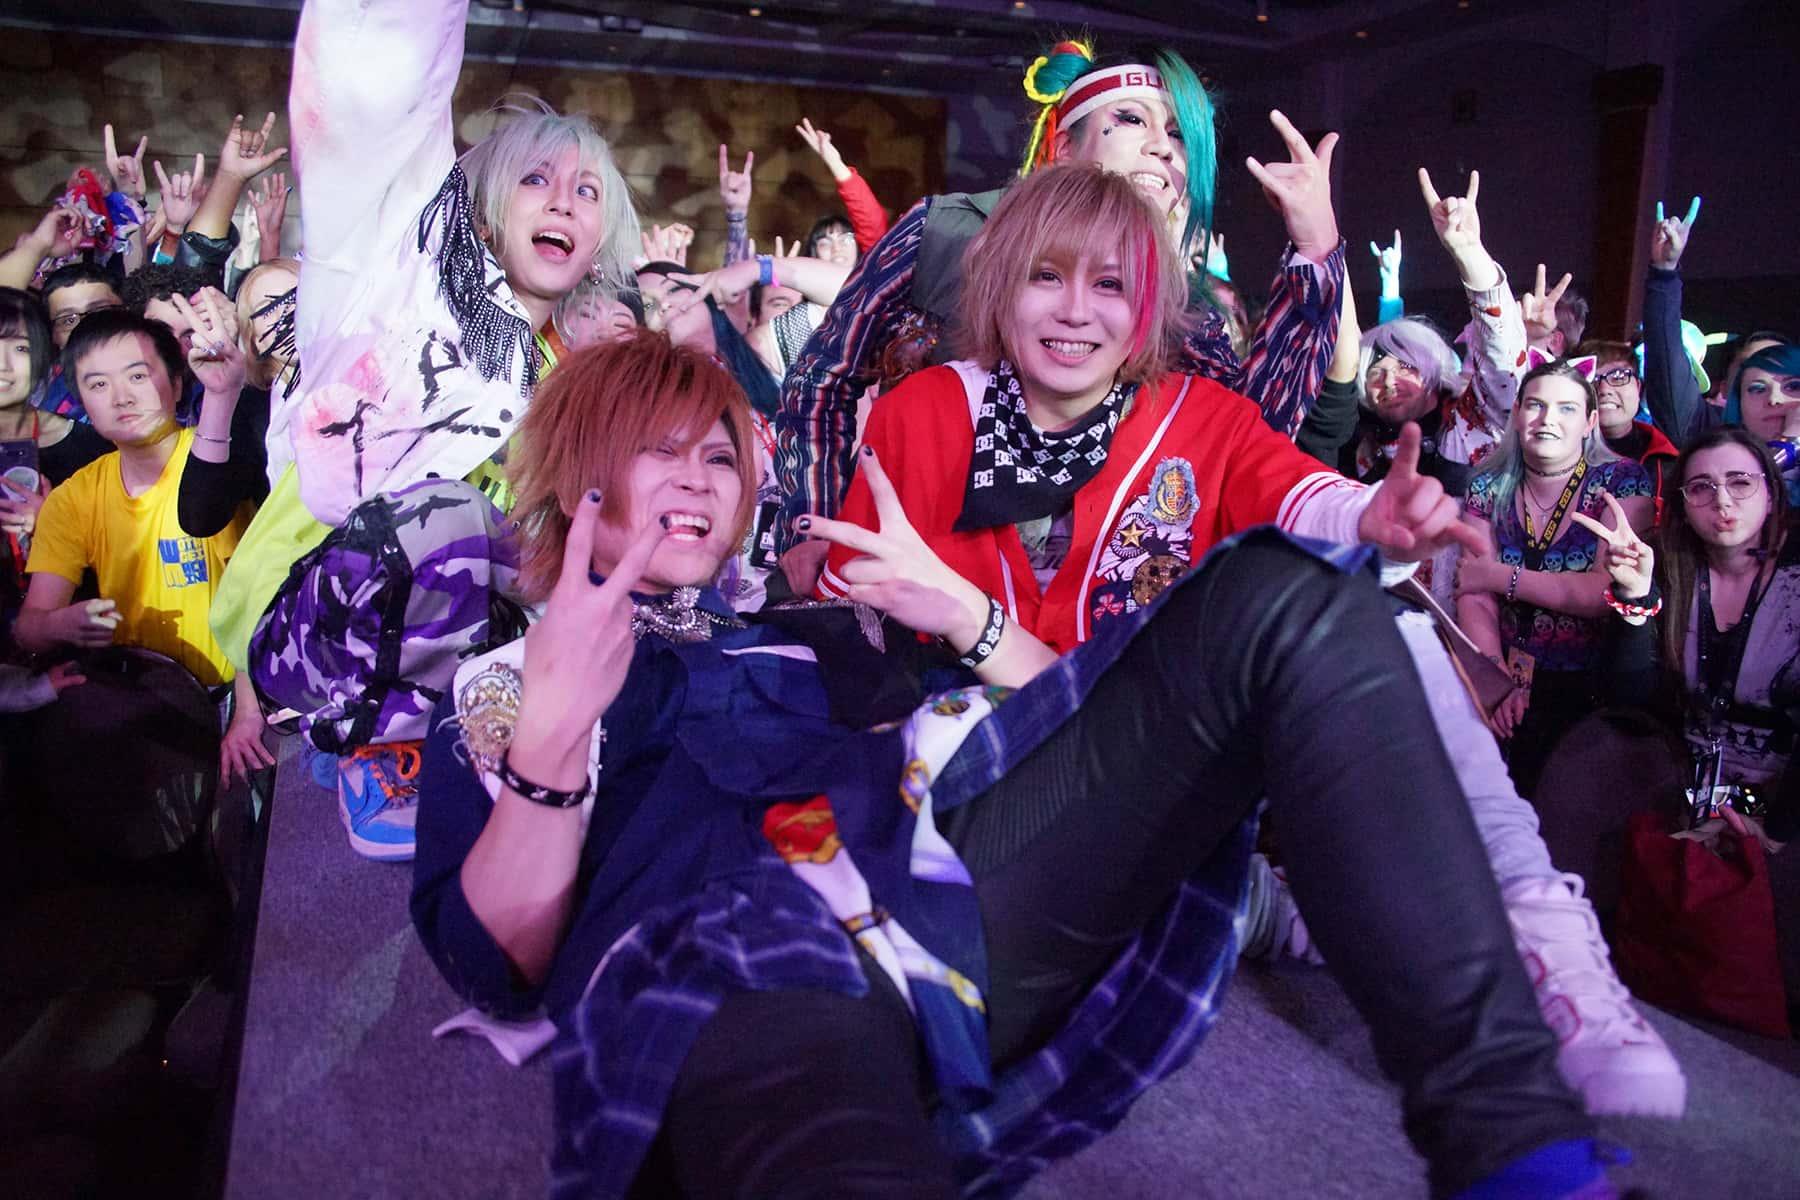 01_021519_animemke_3703